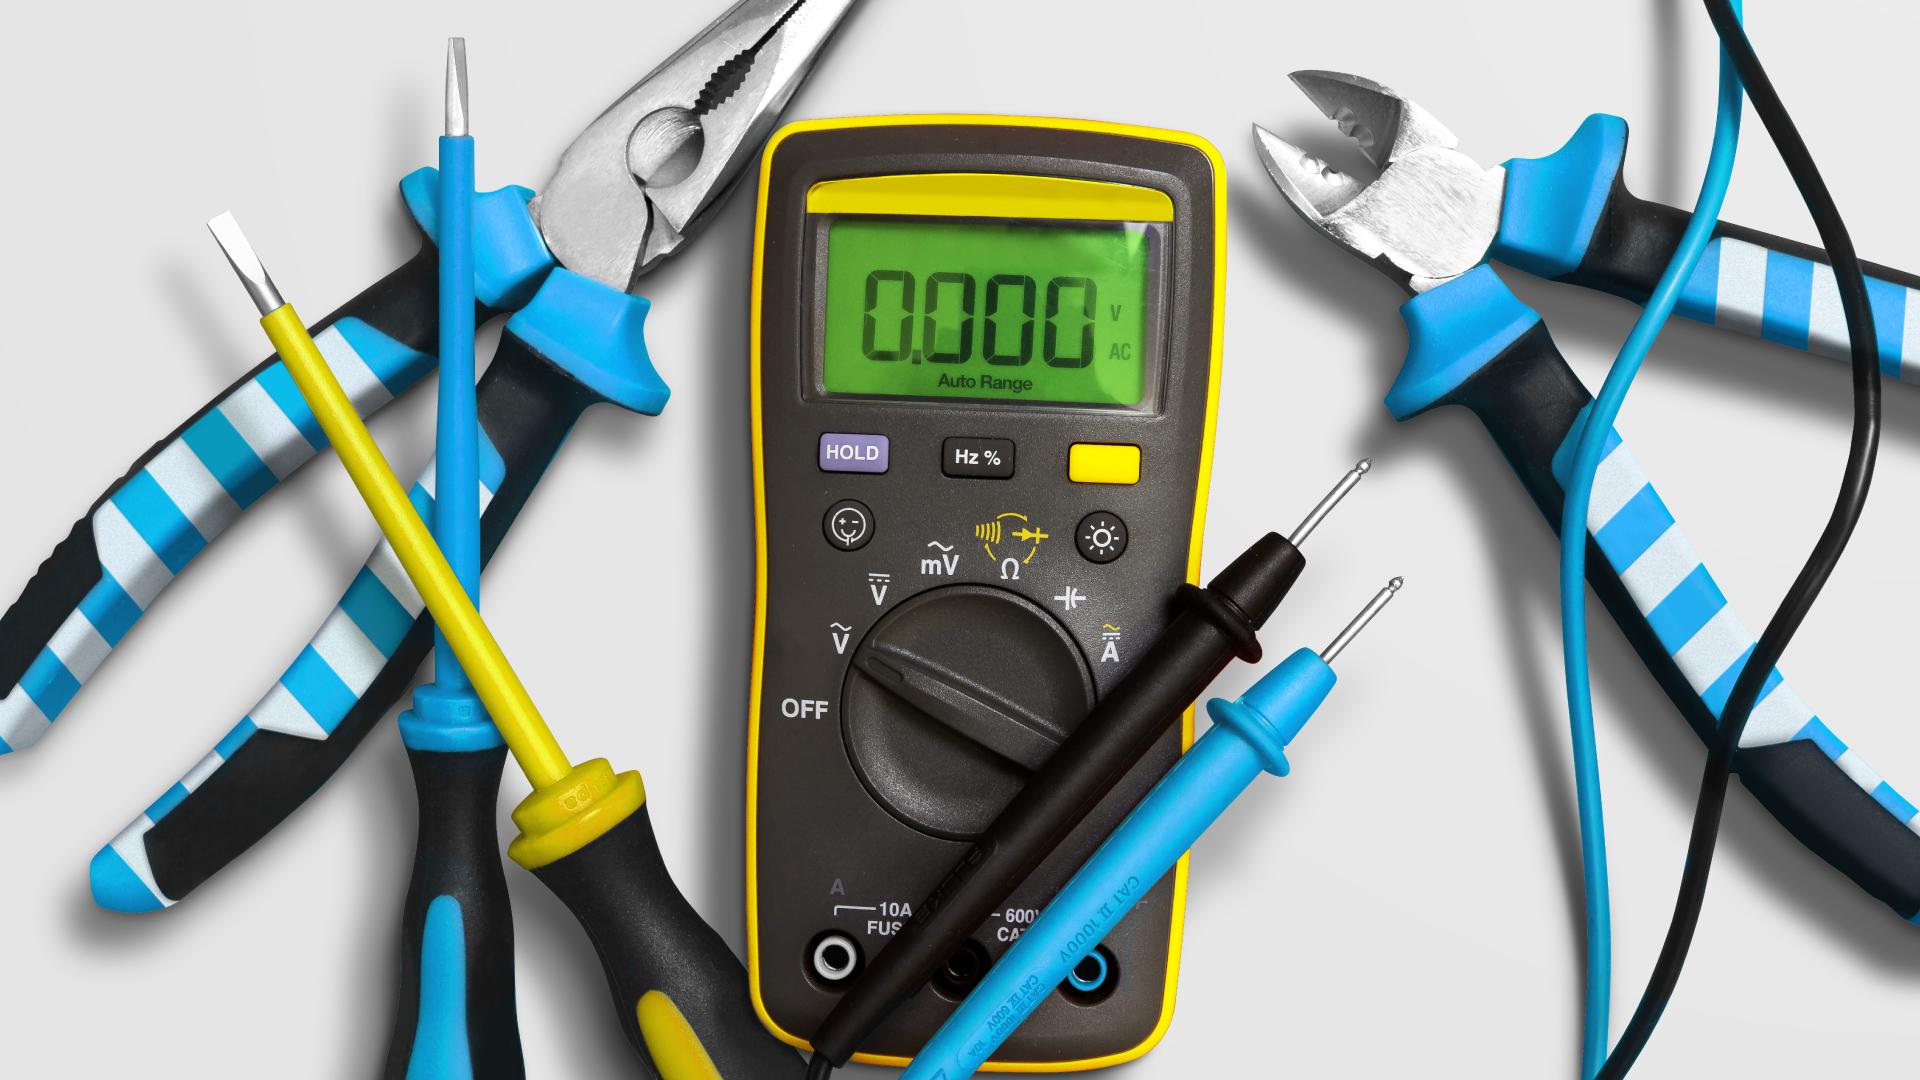 Chris_Britton_Electrician_Daniel_Britton_Applied_Branding_Website_Images_100820_15